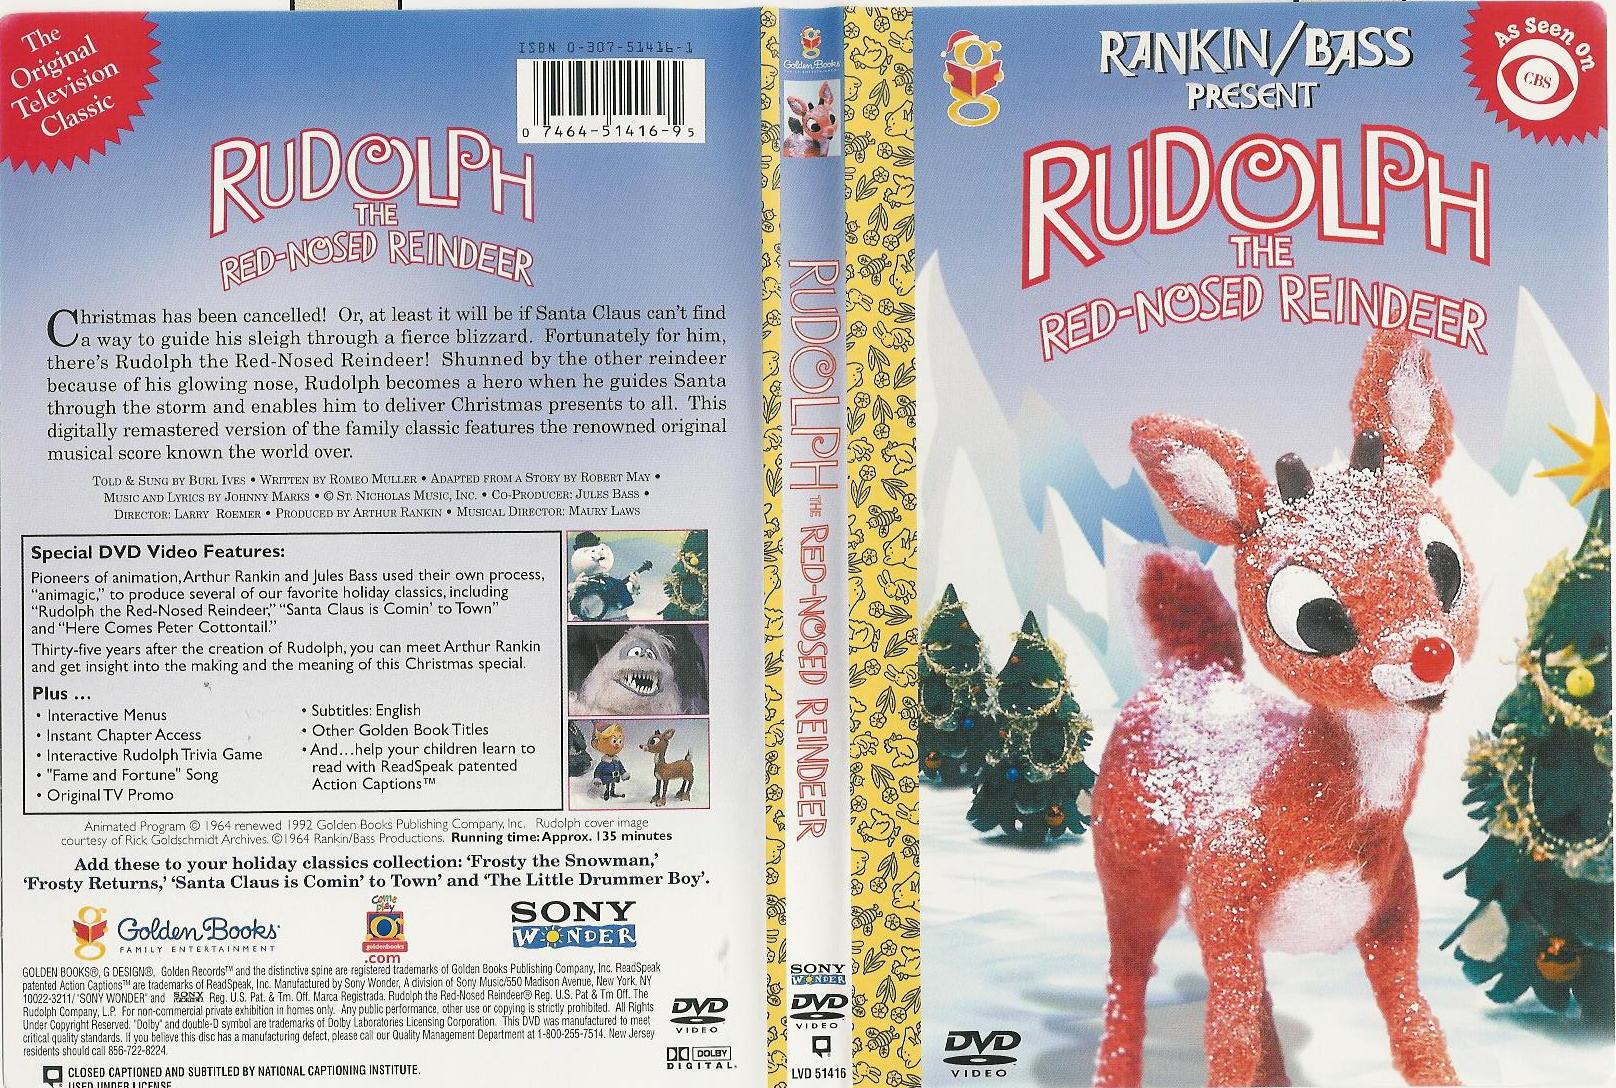 Covers Box Sk Rudolph The Red Nosed Reindeer High Quality Dvd Blueray Movie,Ina Garten Beef Tenderloin Mustard Sauce